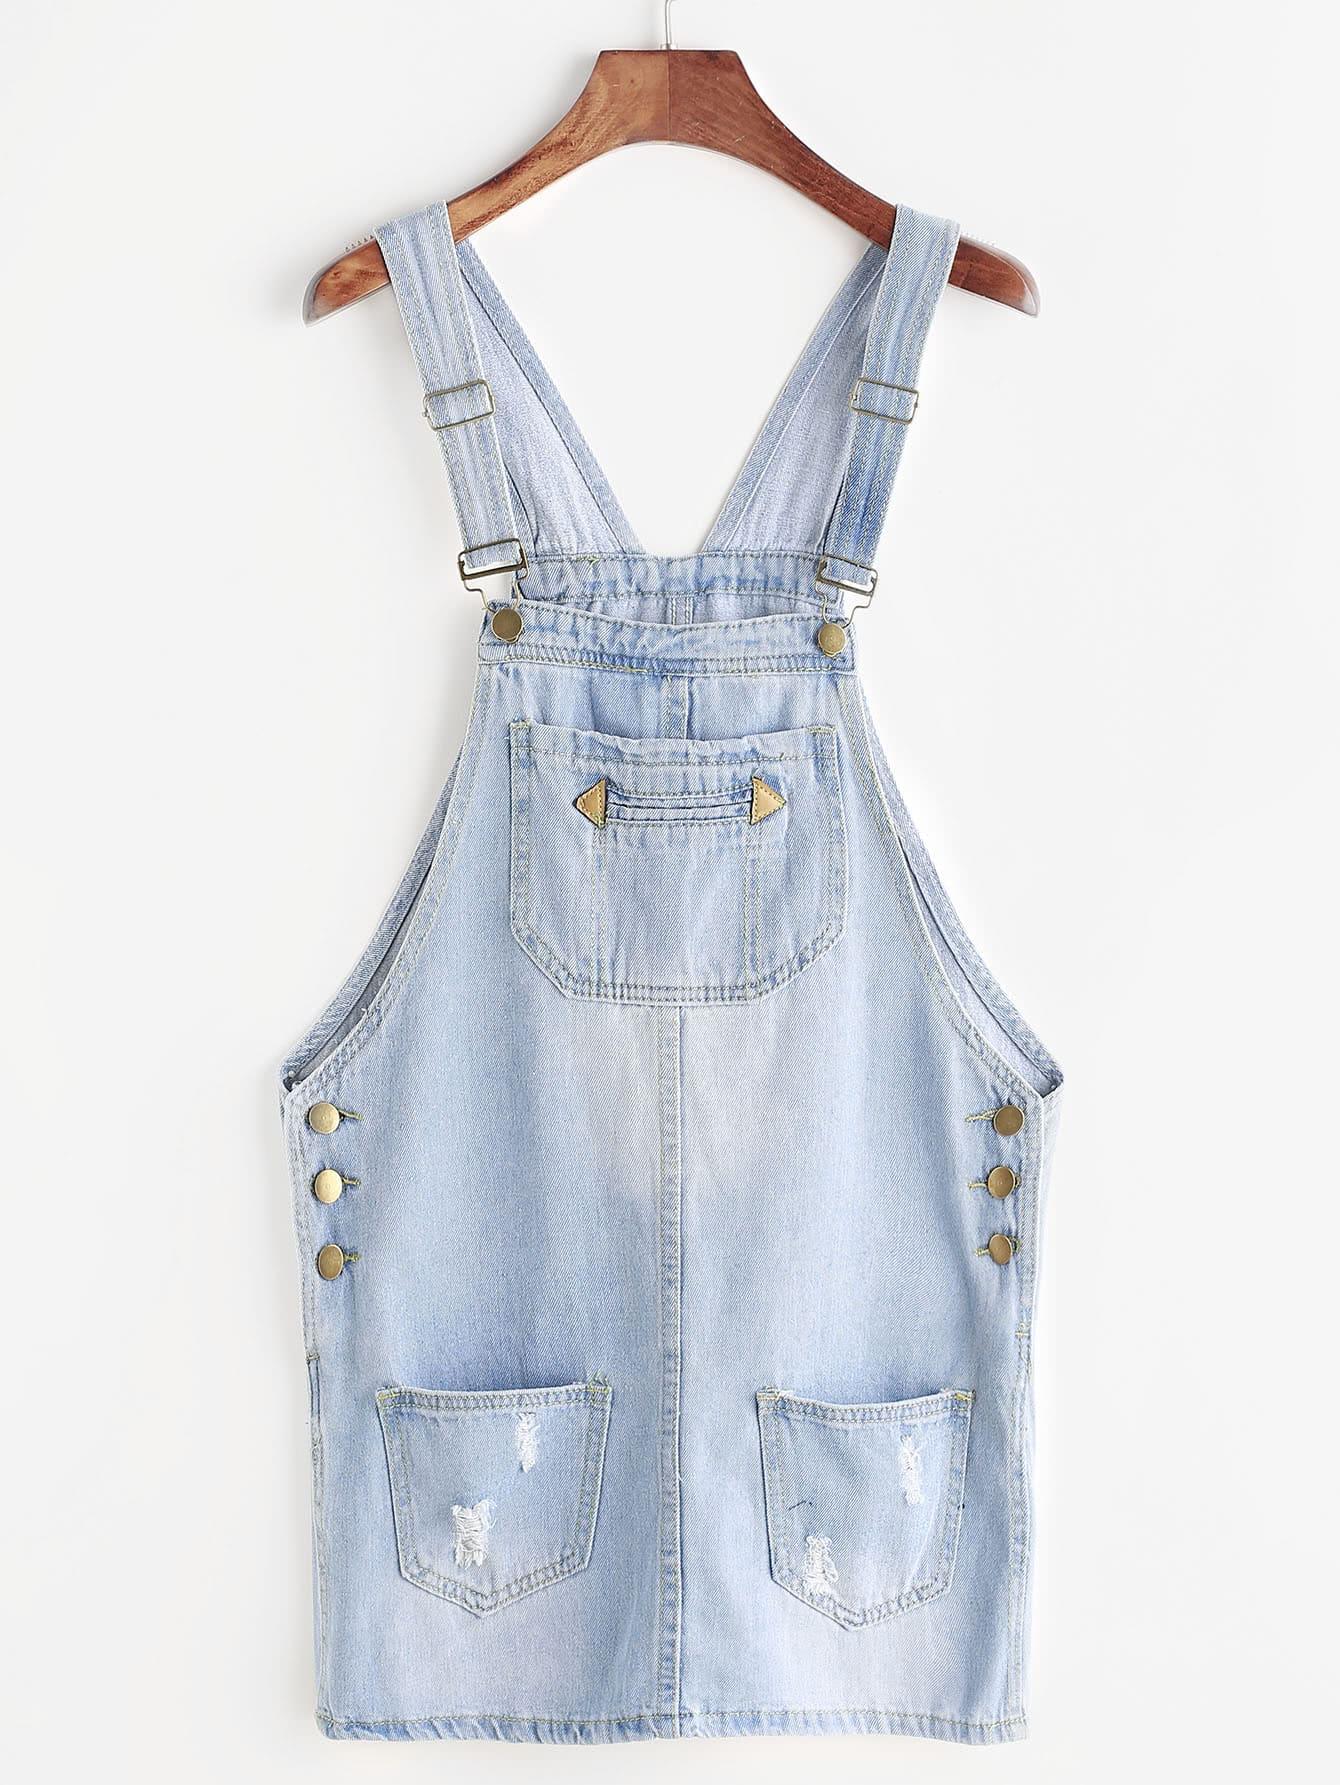 Купить со скидкой Ripped Bleach Wash Denim Overall Dress